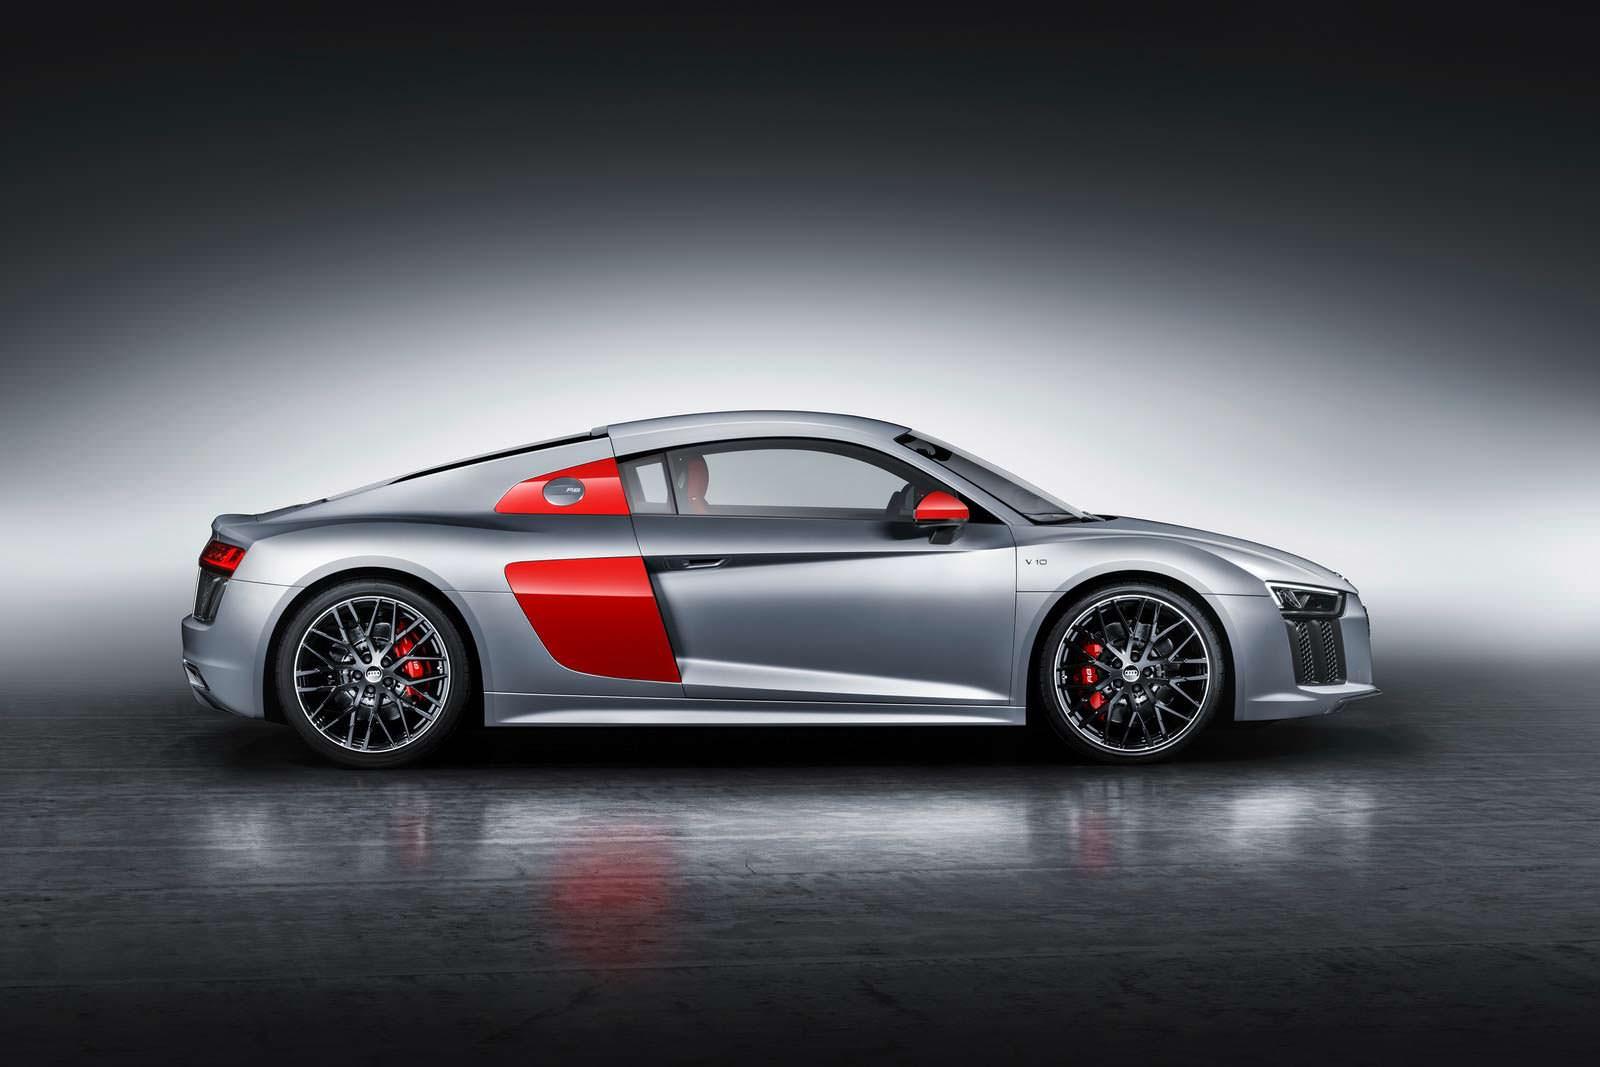 Фото | Новая Audi R8 Audi Sport. Спецверсия 2017 года